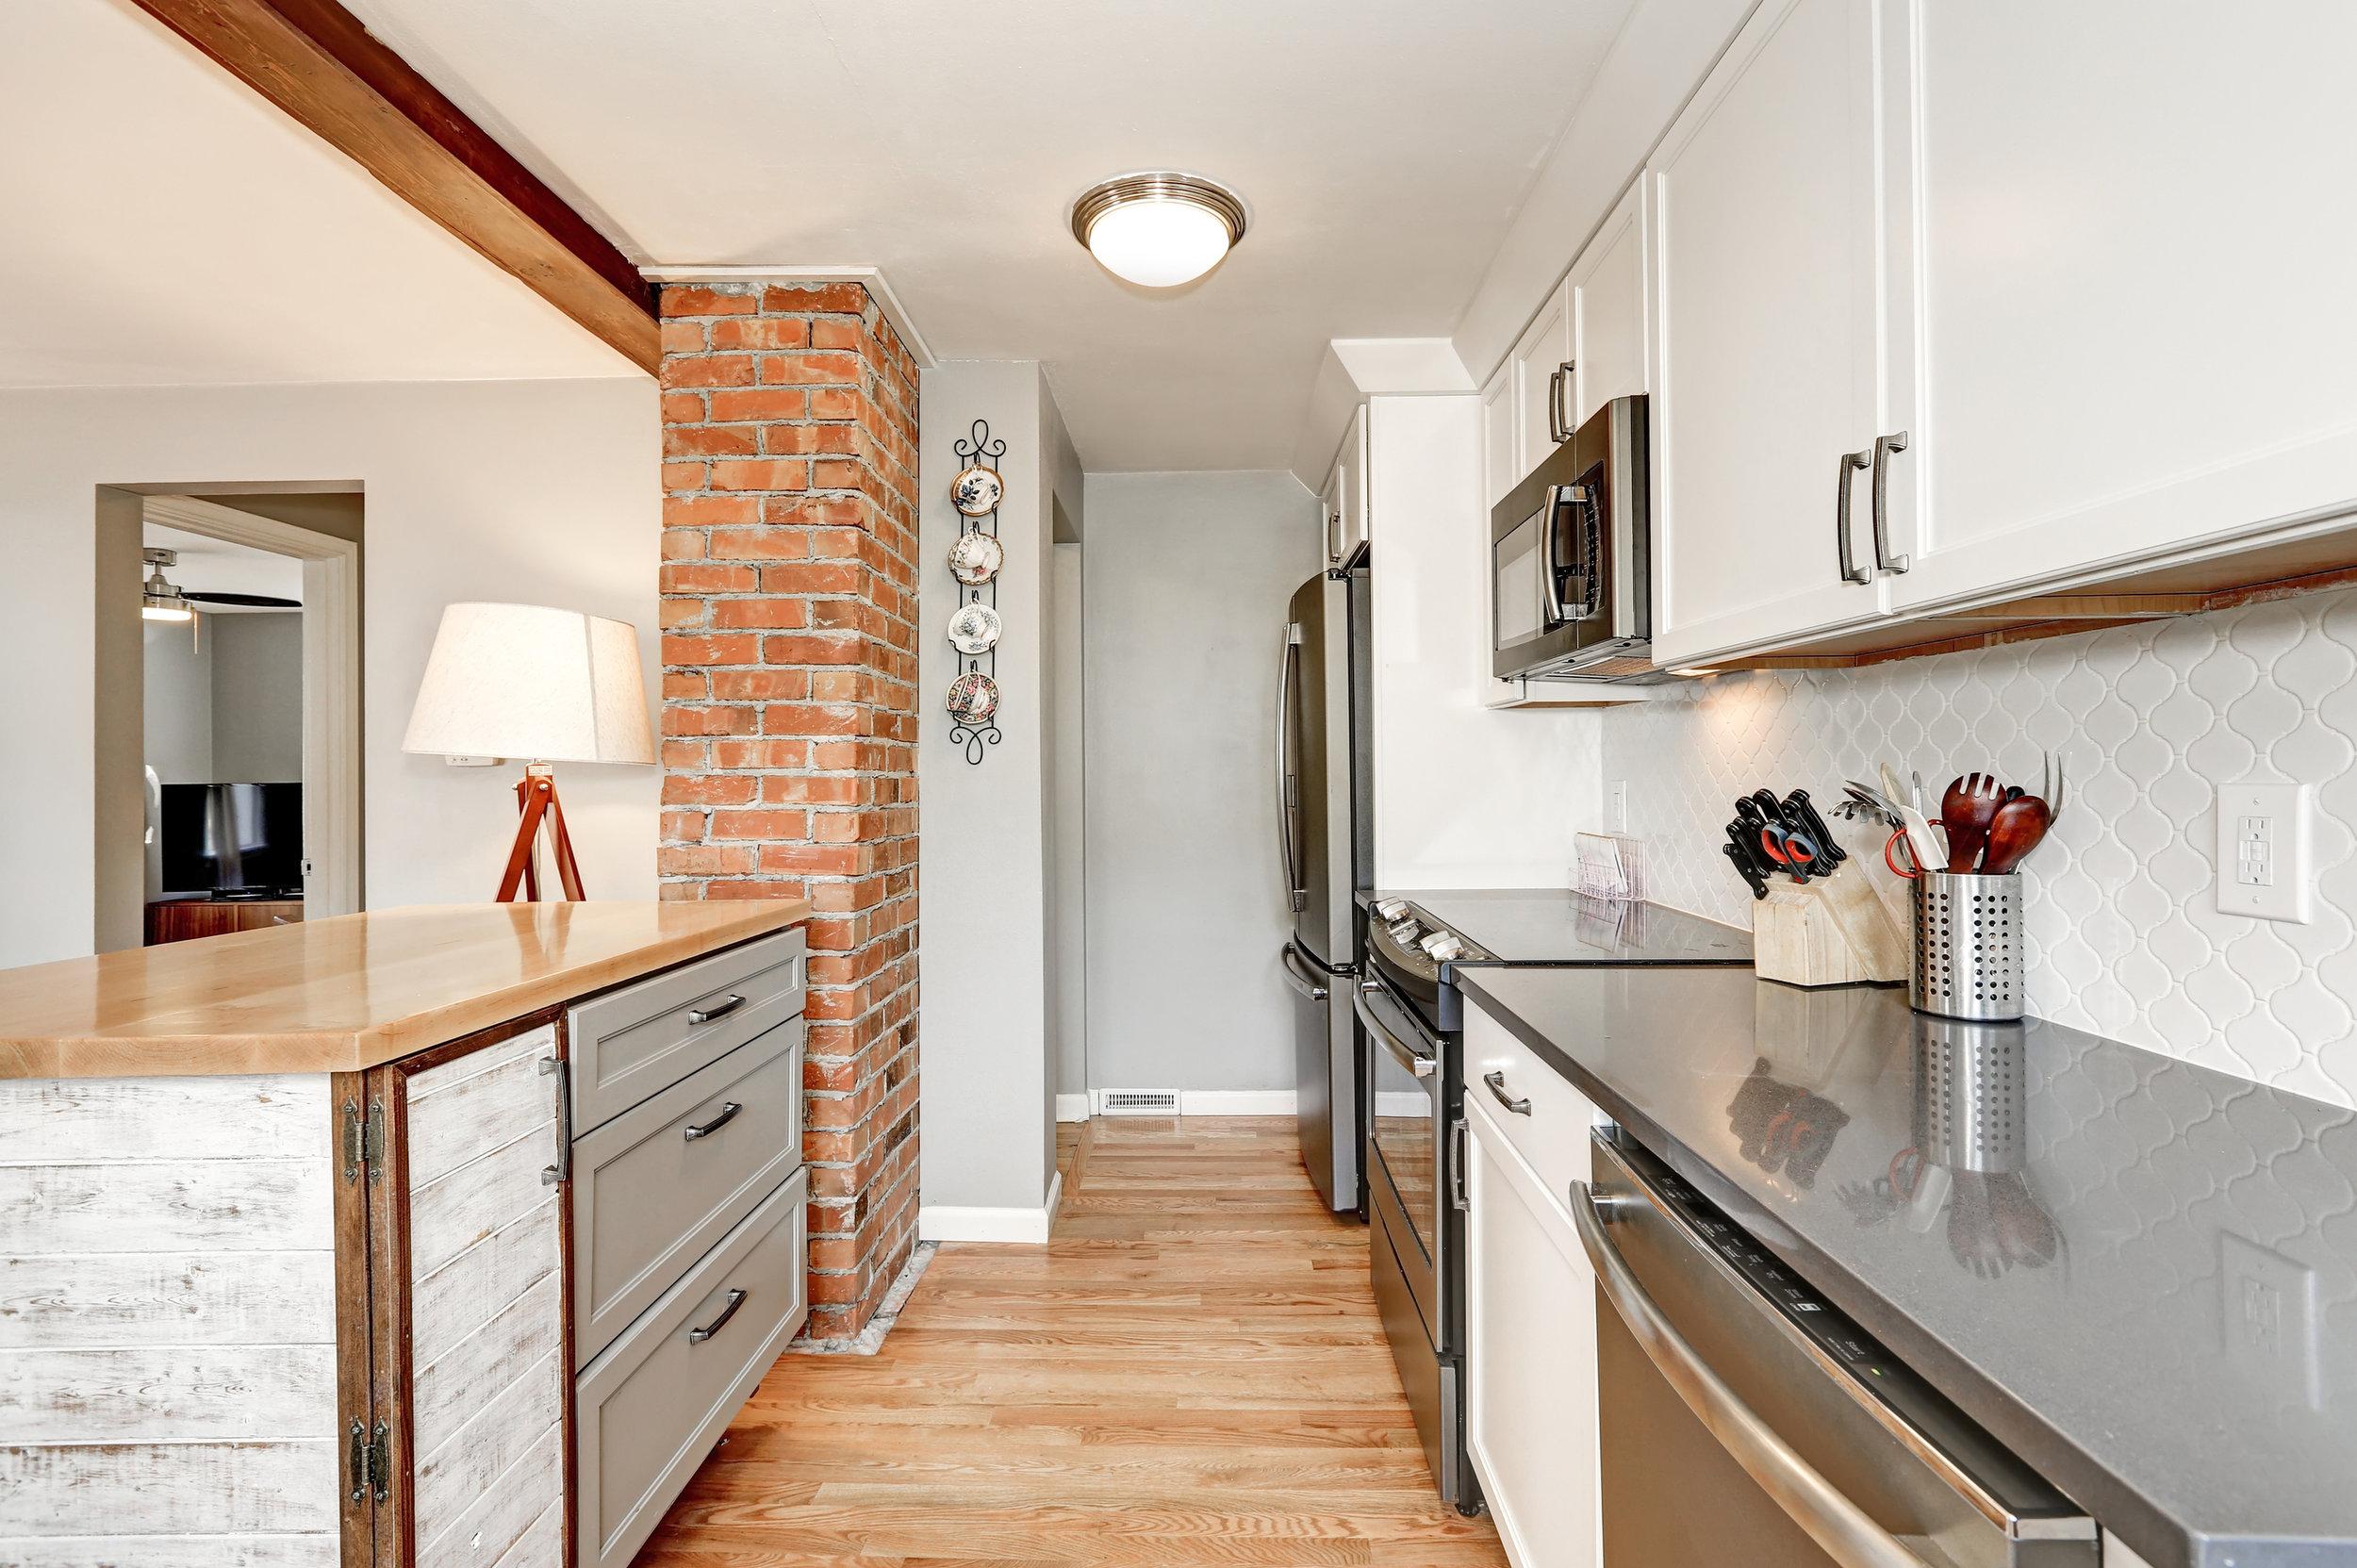 bigstock-White-And-Grey-Kitchen-Room-I-152876744.jpg